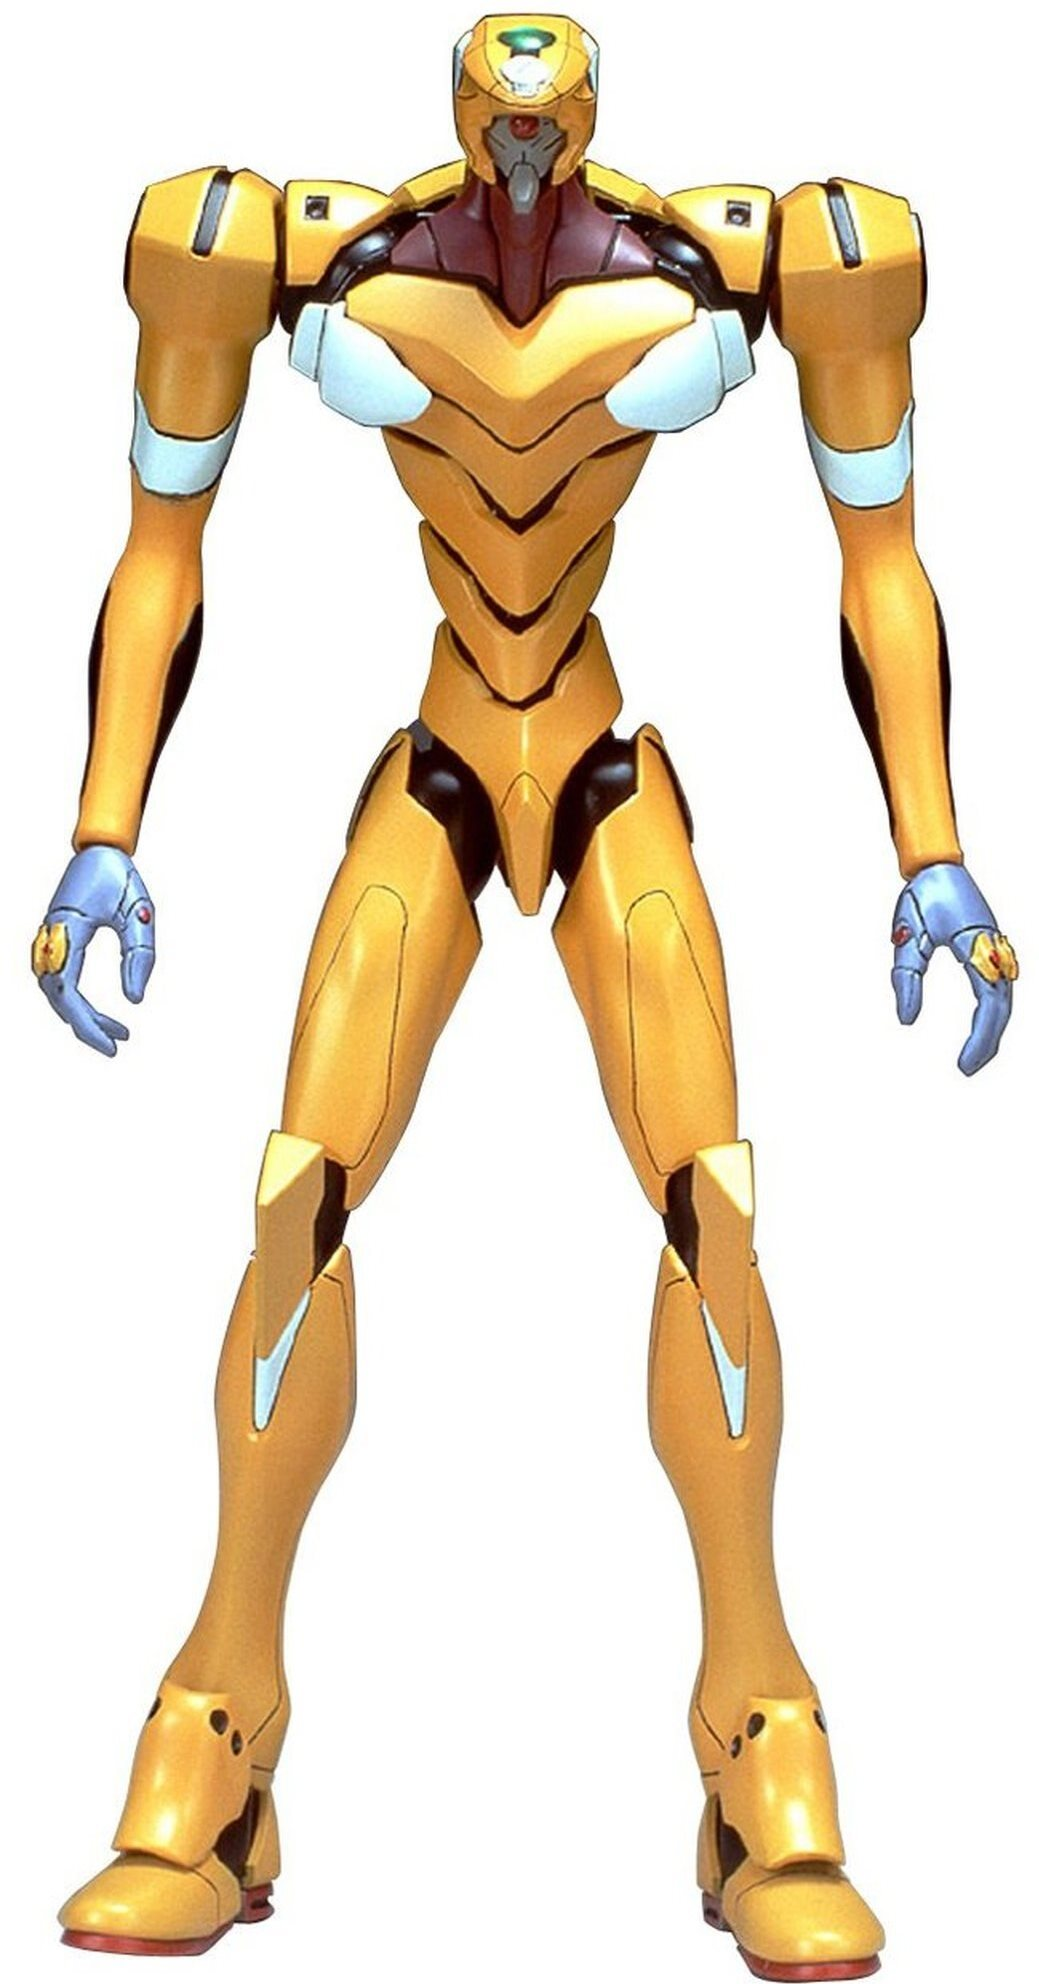 "Bandai/Gundam Wing #003 Eva-00 Prototype (Orange) (Rei) Hg Model Kit, From \""Evangel"